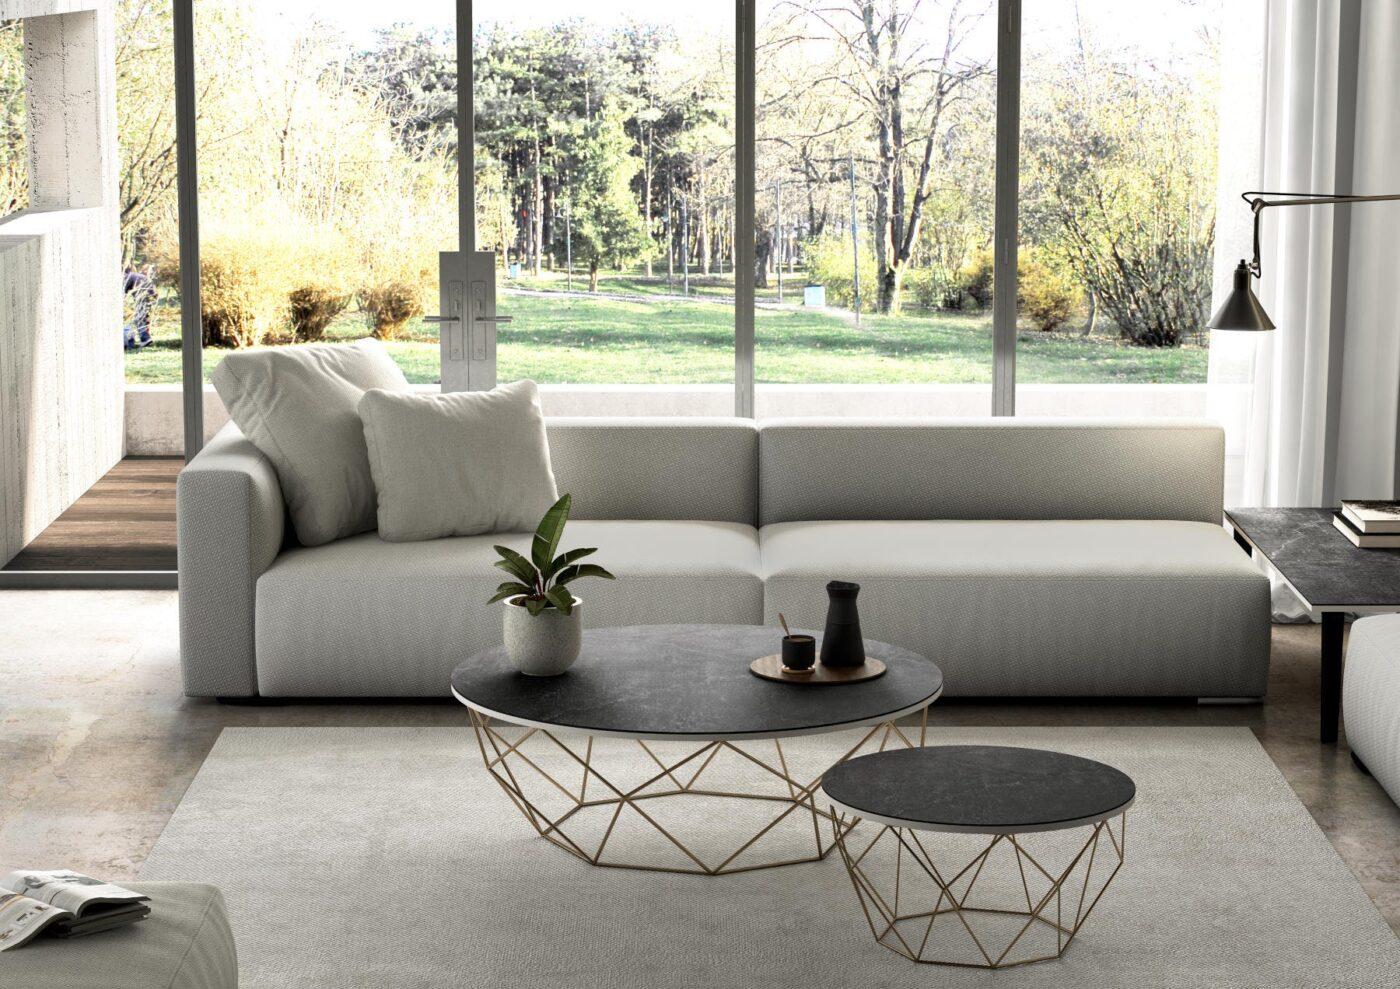 Image of Mesa Dekton Slim Table Detalle Laos 2 1 in Dekton | Furniture - Cosentino